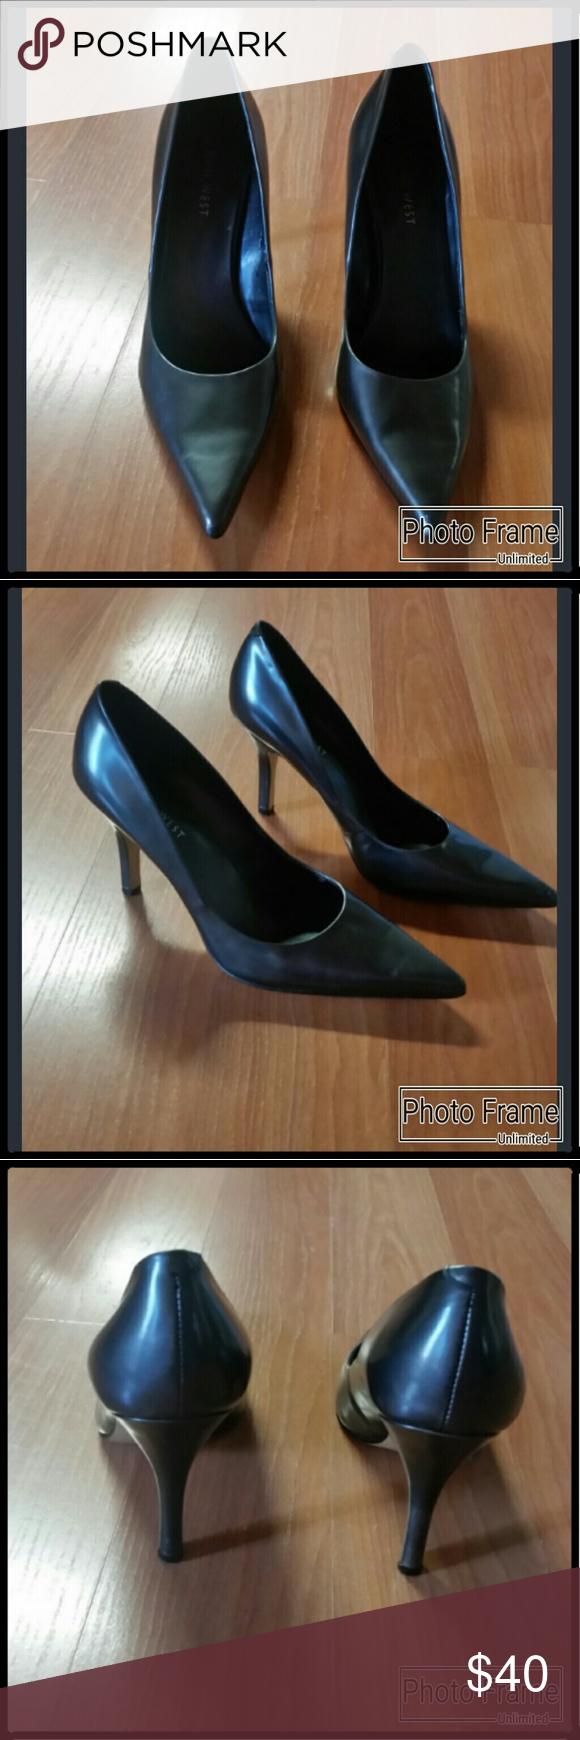 9223f23bfe12 Nine West Heels Shiny grey patent heels by Nine West. These heels are in  EUC. Heels are a Size 61 2. Nine West Shoes Heels